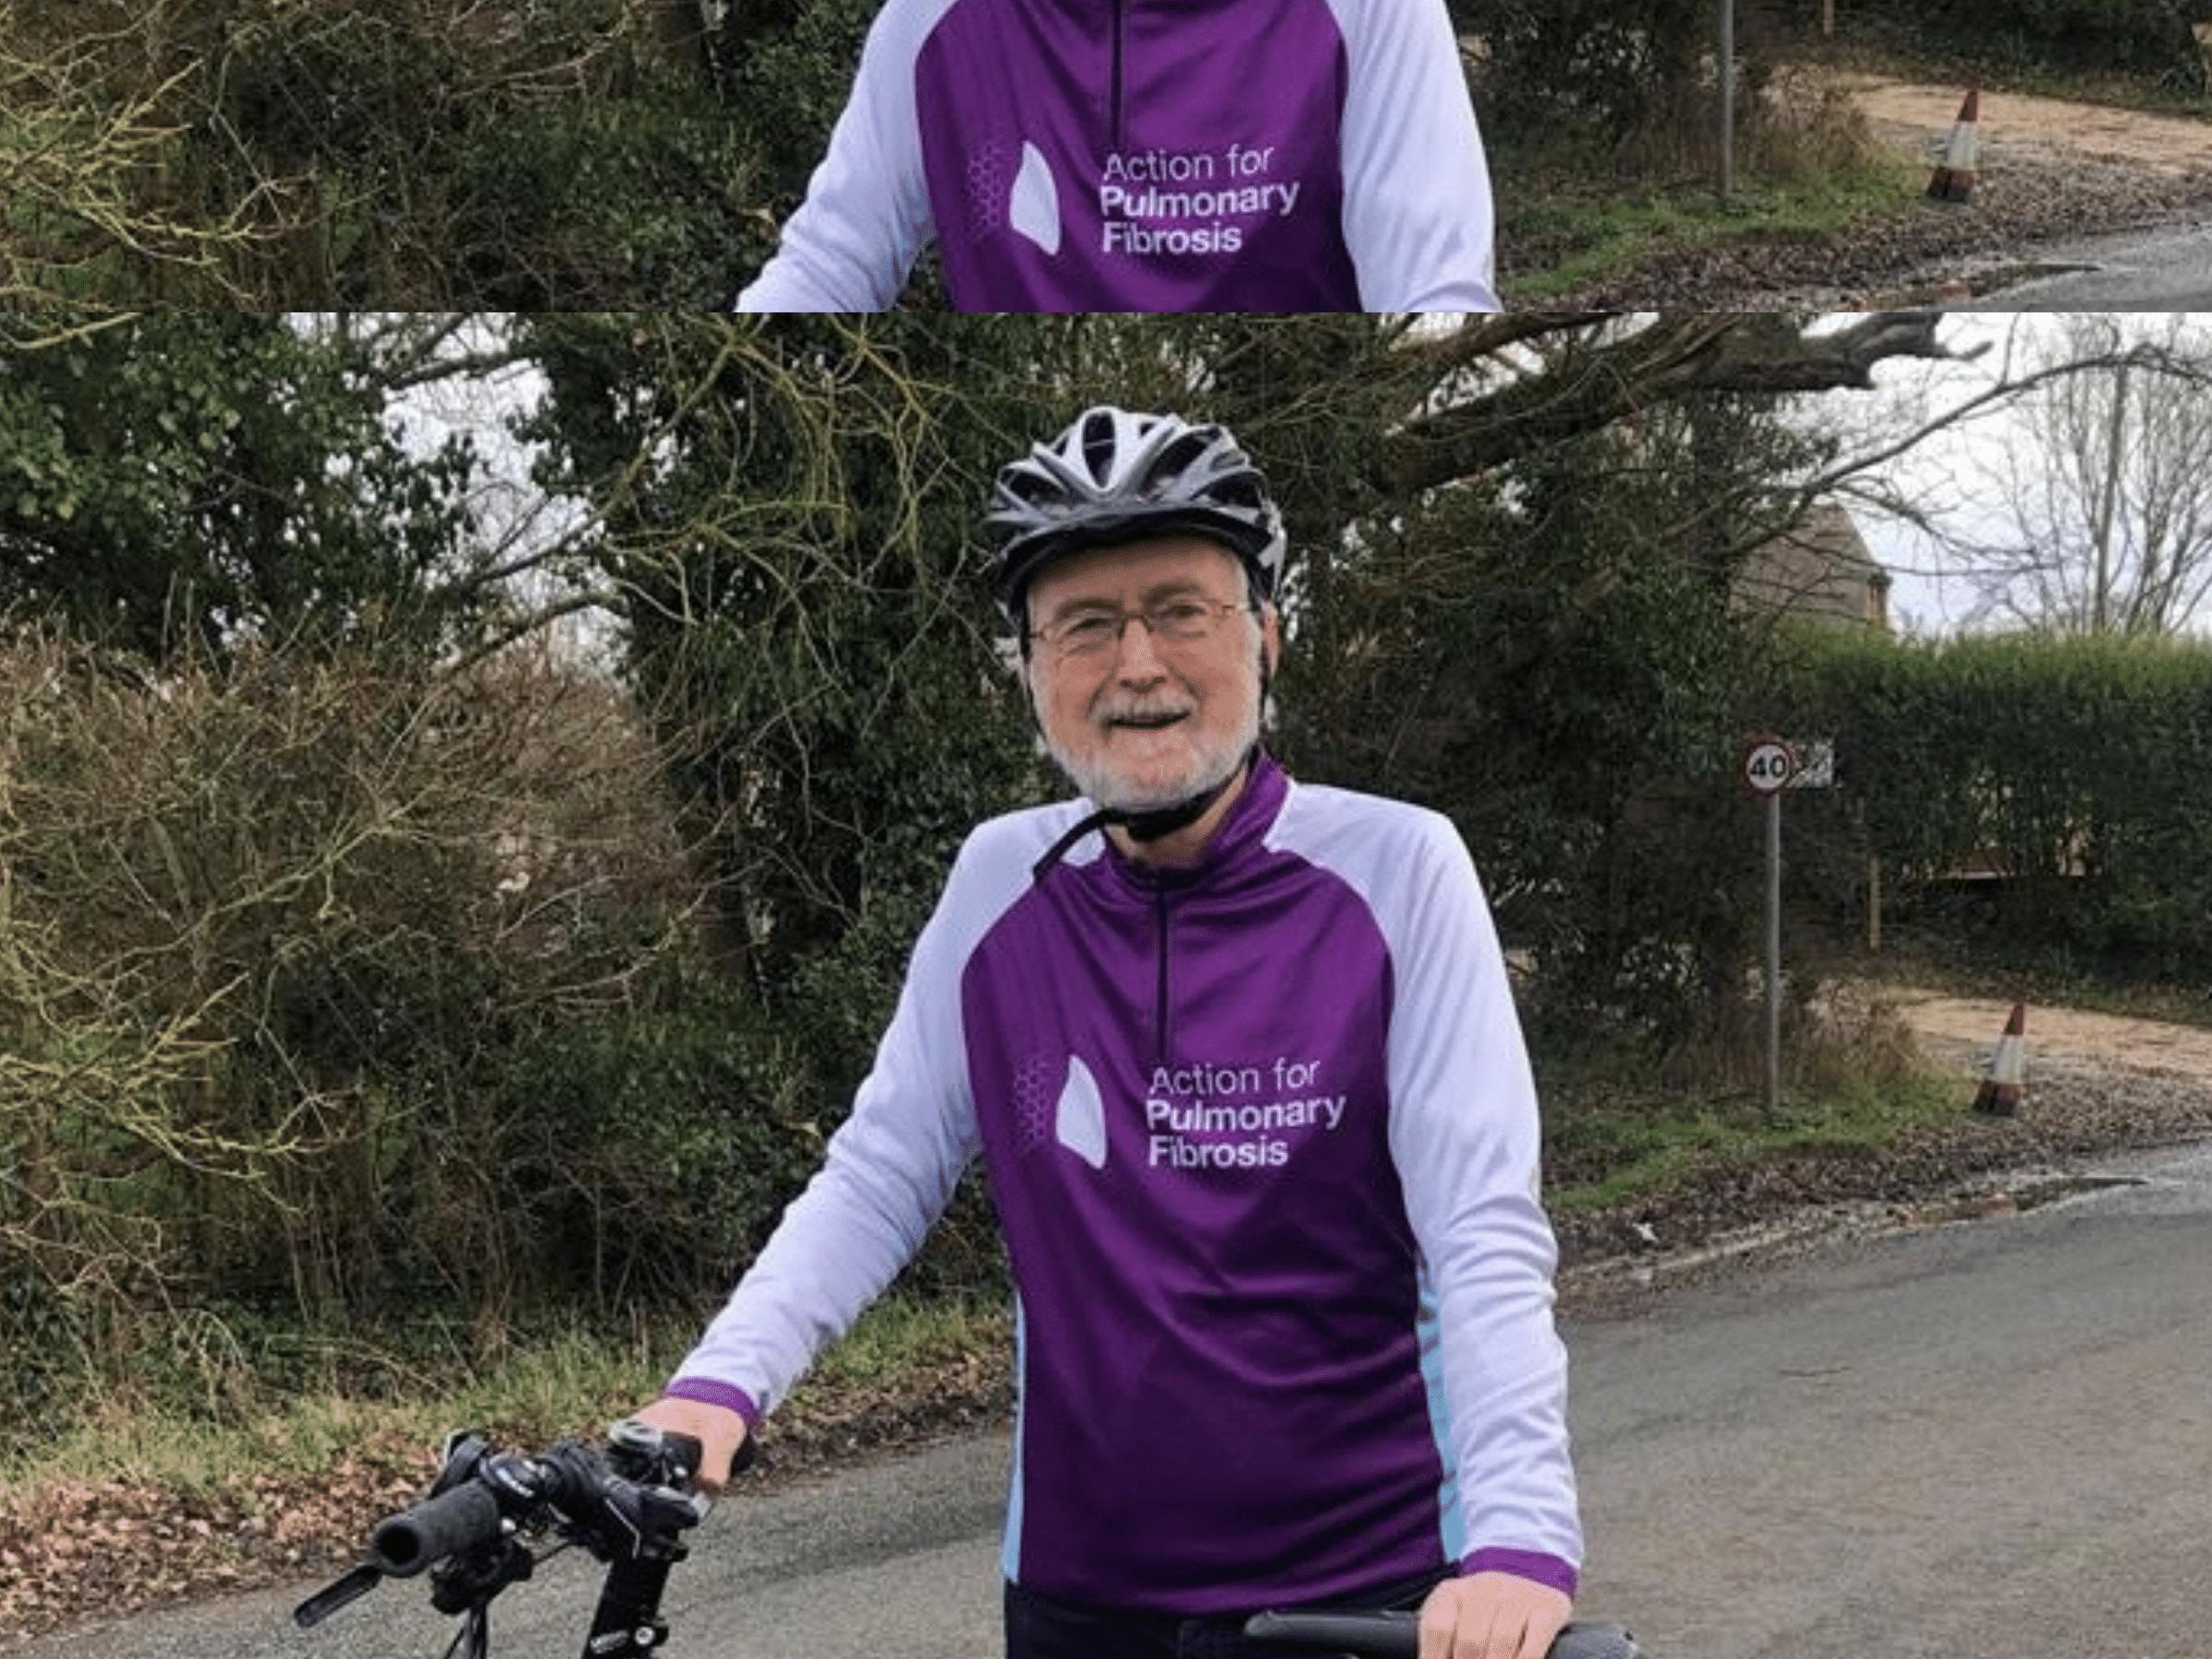 Steve Jones with his bicycle